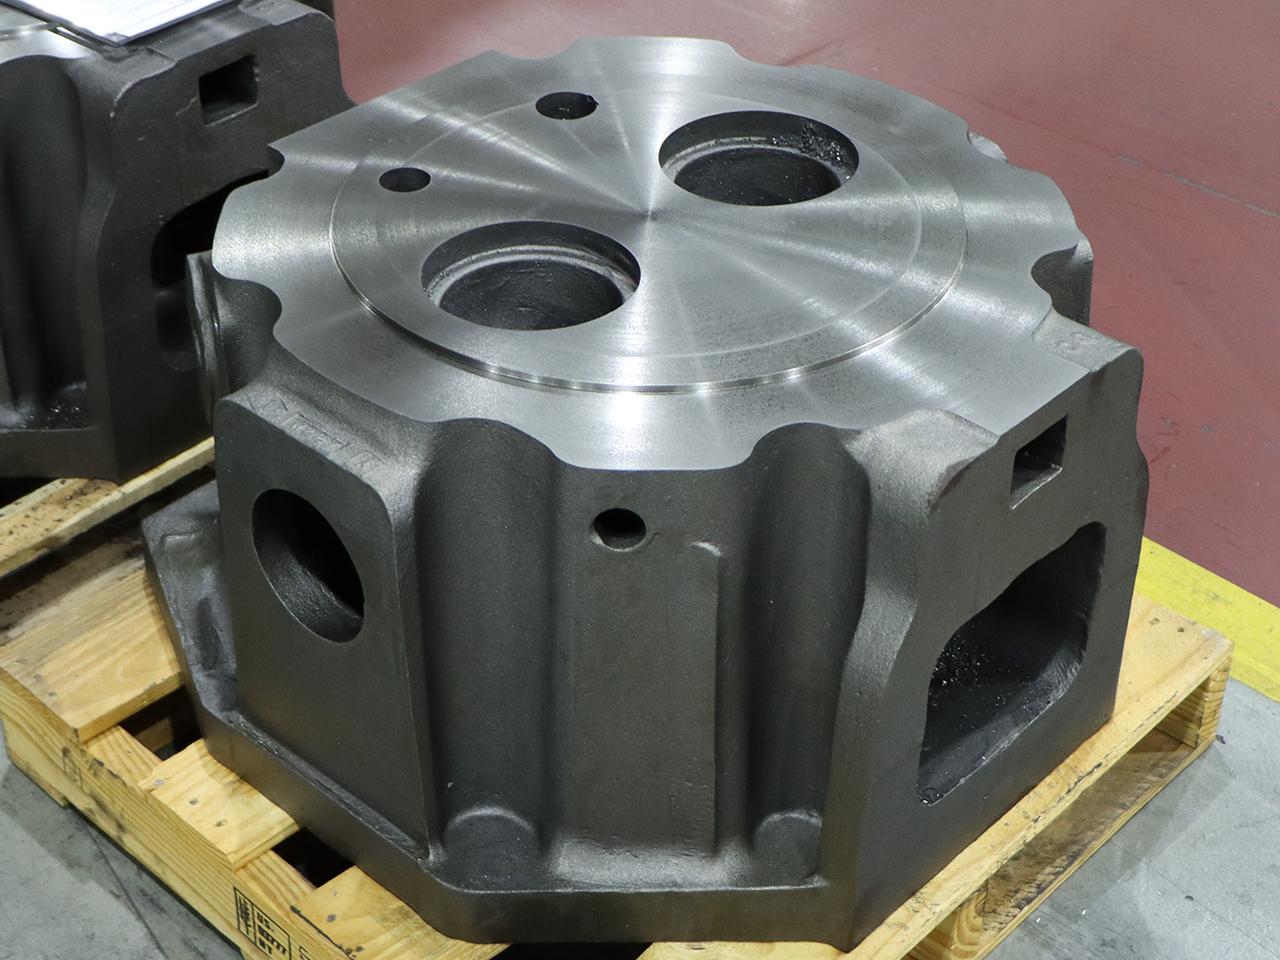 Ingersoll Rand KVS Dual Exhaust Power Head